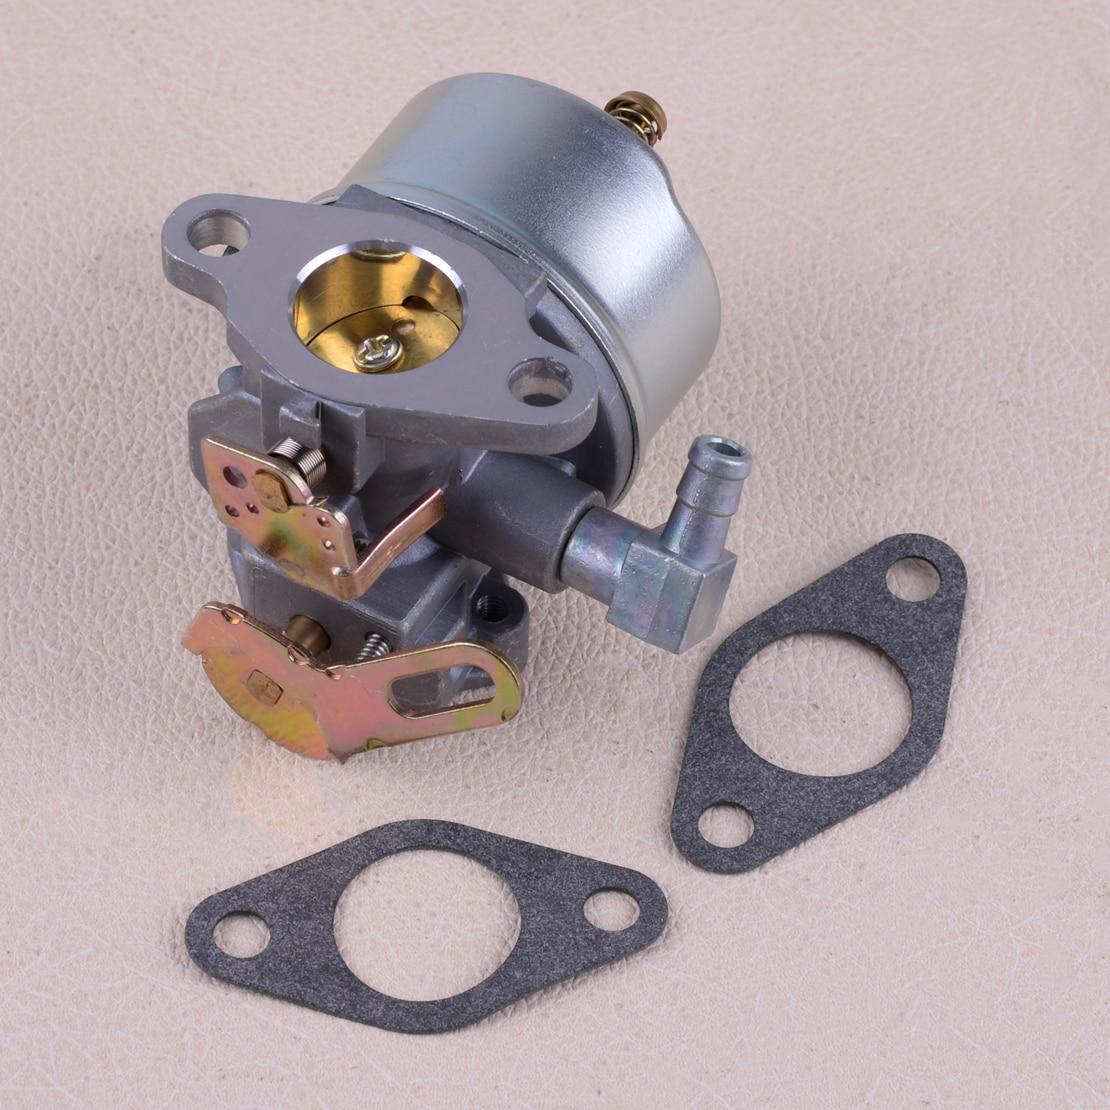 Adjustable Carburetor Metal Fit For Tecumseh Snapper Yardman 421 521 4HP 5HP Snow Blower 640084B 632107A 632107 640084A